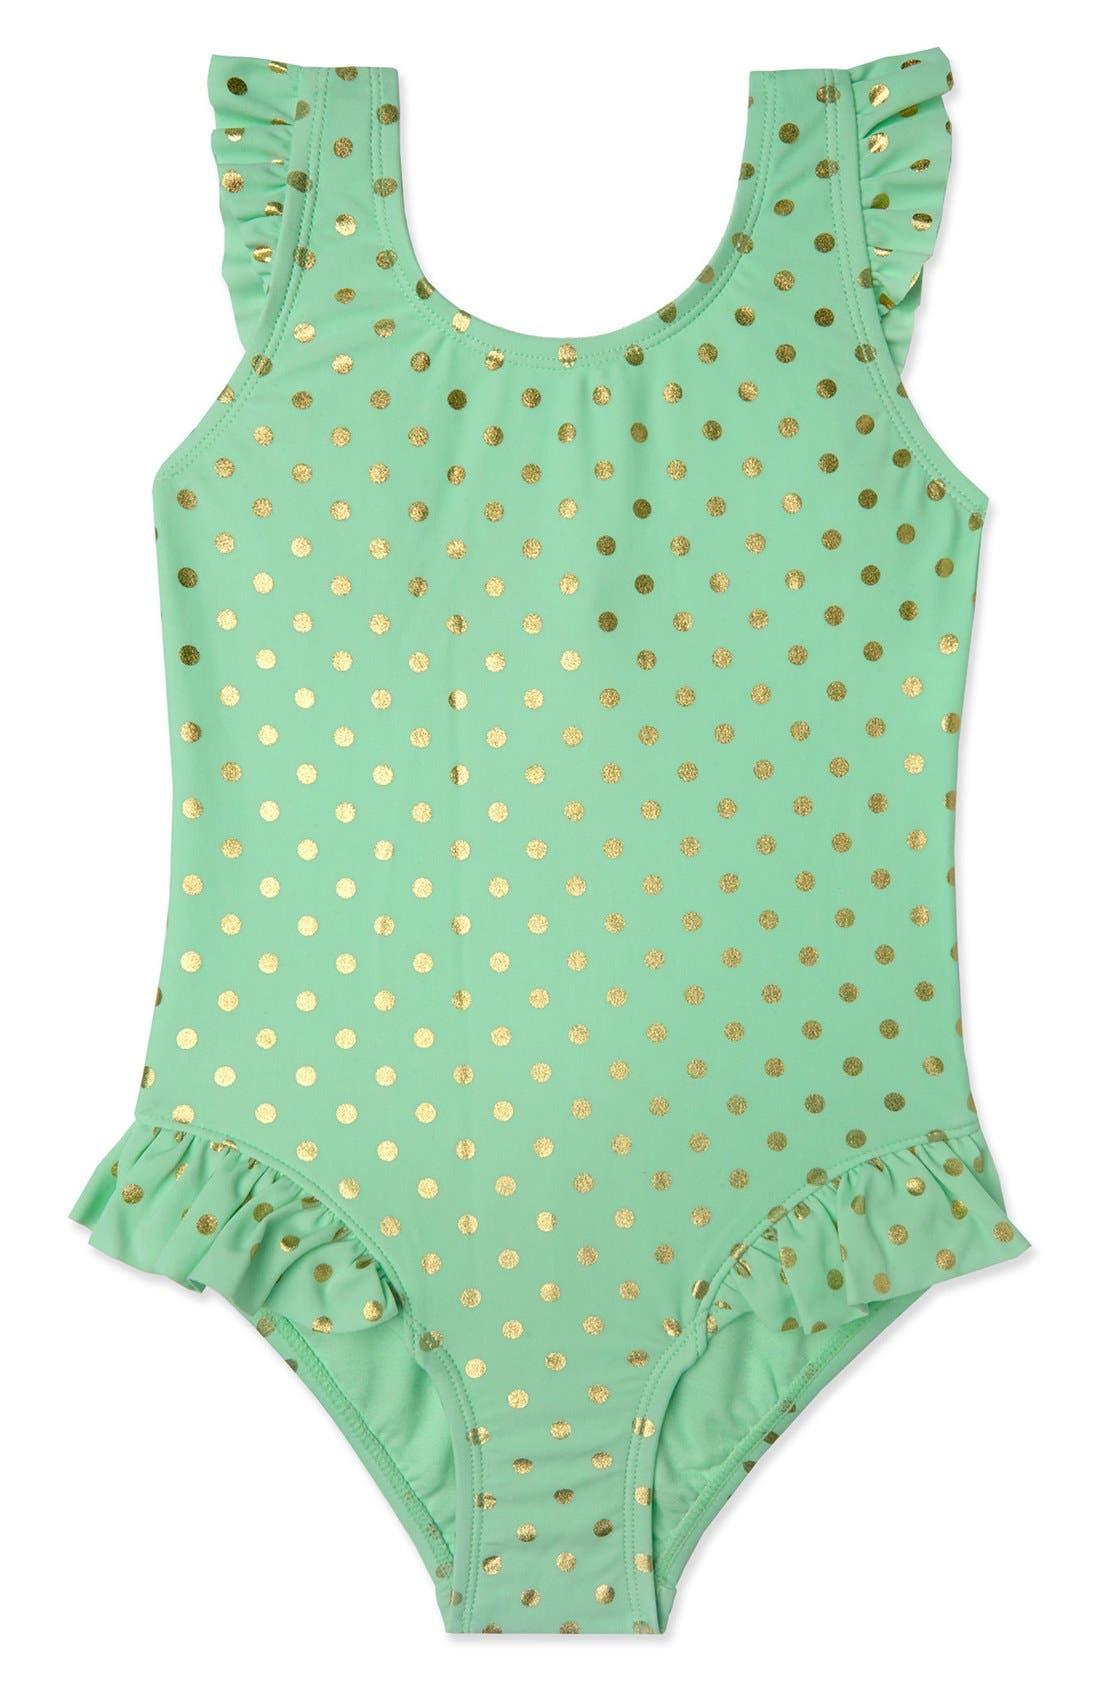 Main Image - Hula Star 'Milkshake' One-Piece Swimsuit (Toddler Girls & Little Girls)